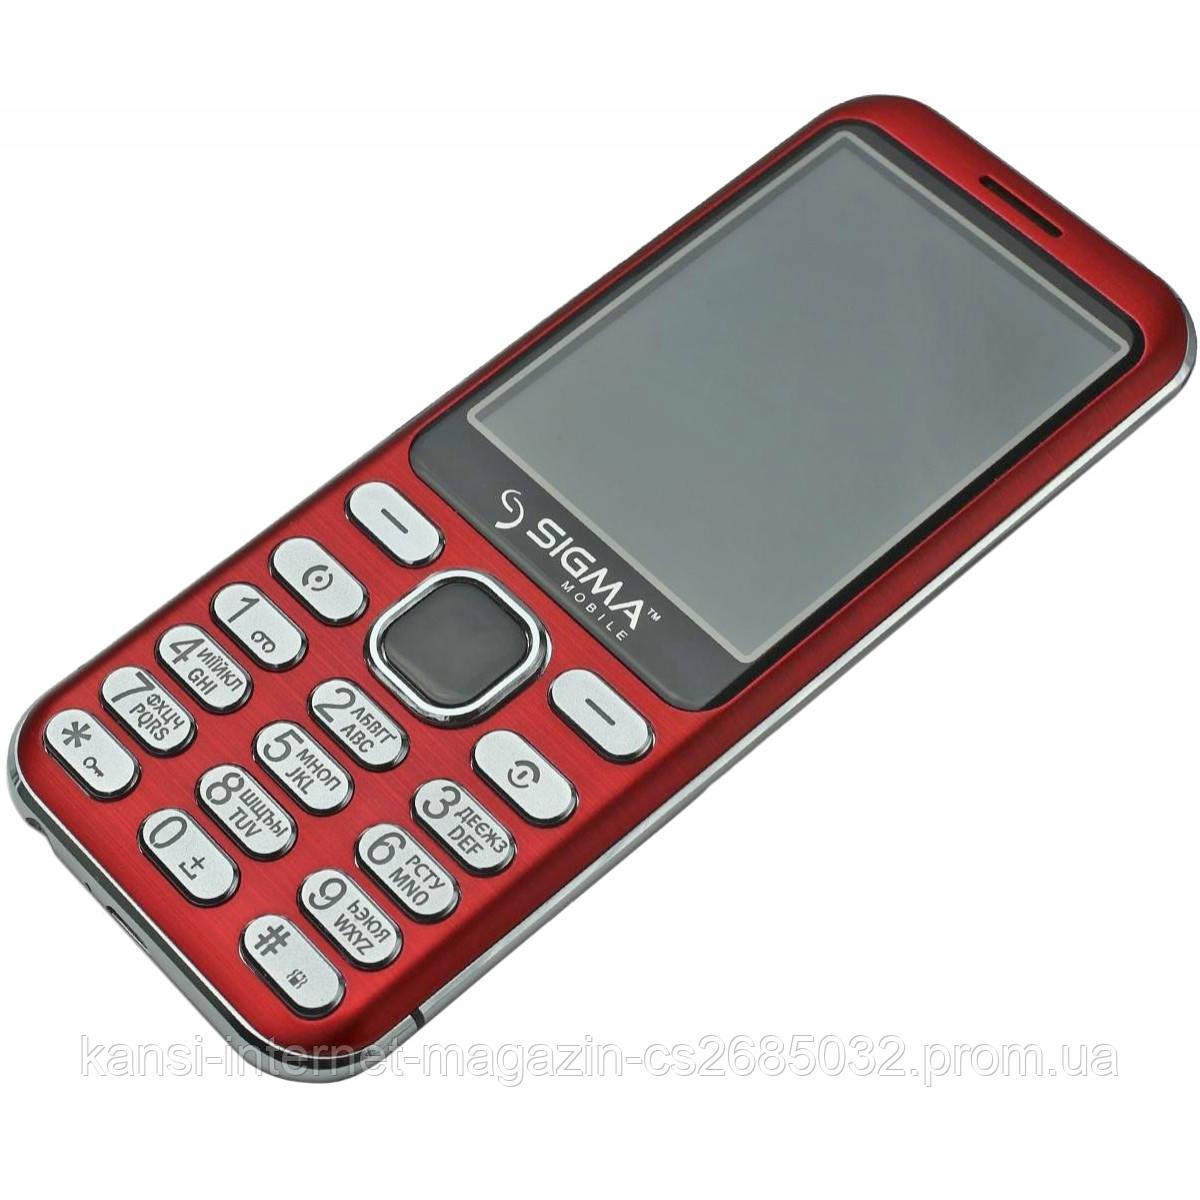 Мобильный телефон Sigma mobile X-style 33 Steel Red